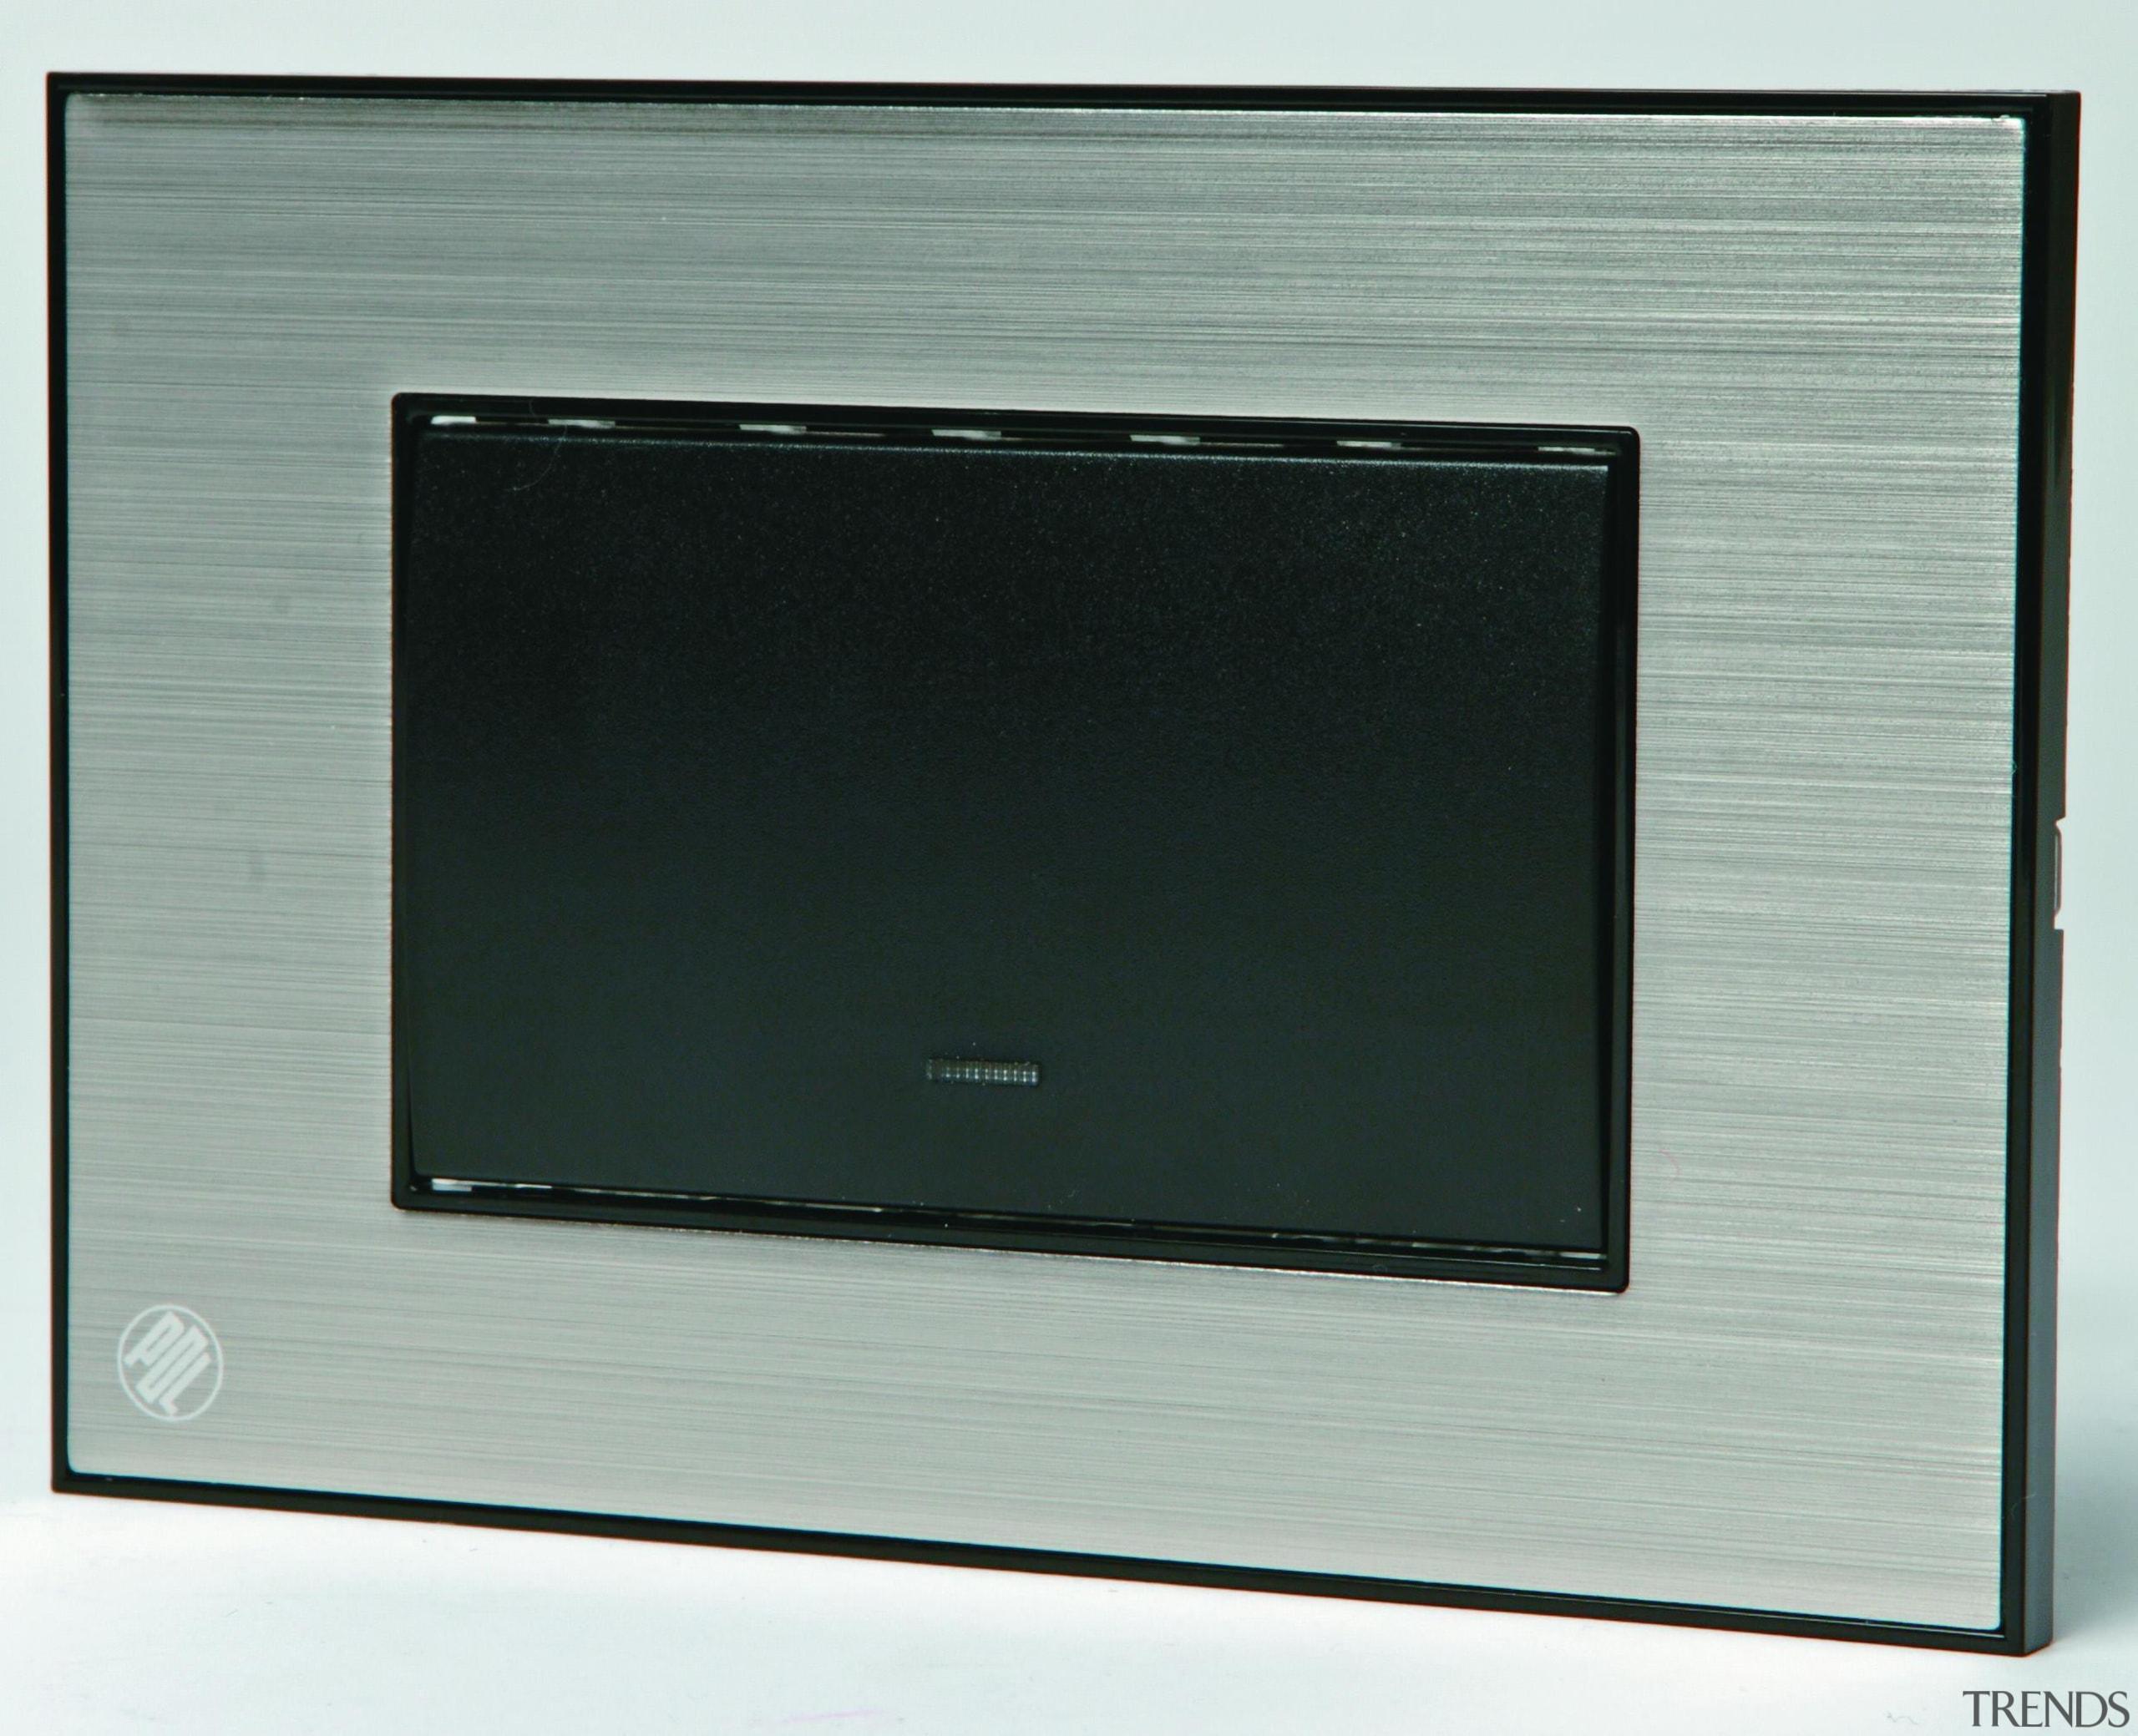 s881-0029985.jpg - s881-0029985.jpg - display device   multimedia display device, multimedia, product design, screen, gray, black